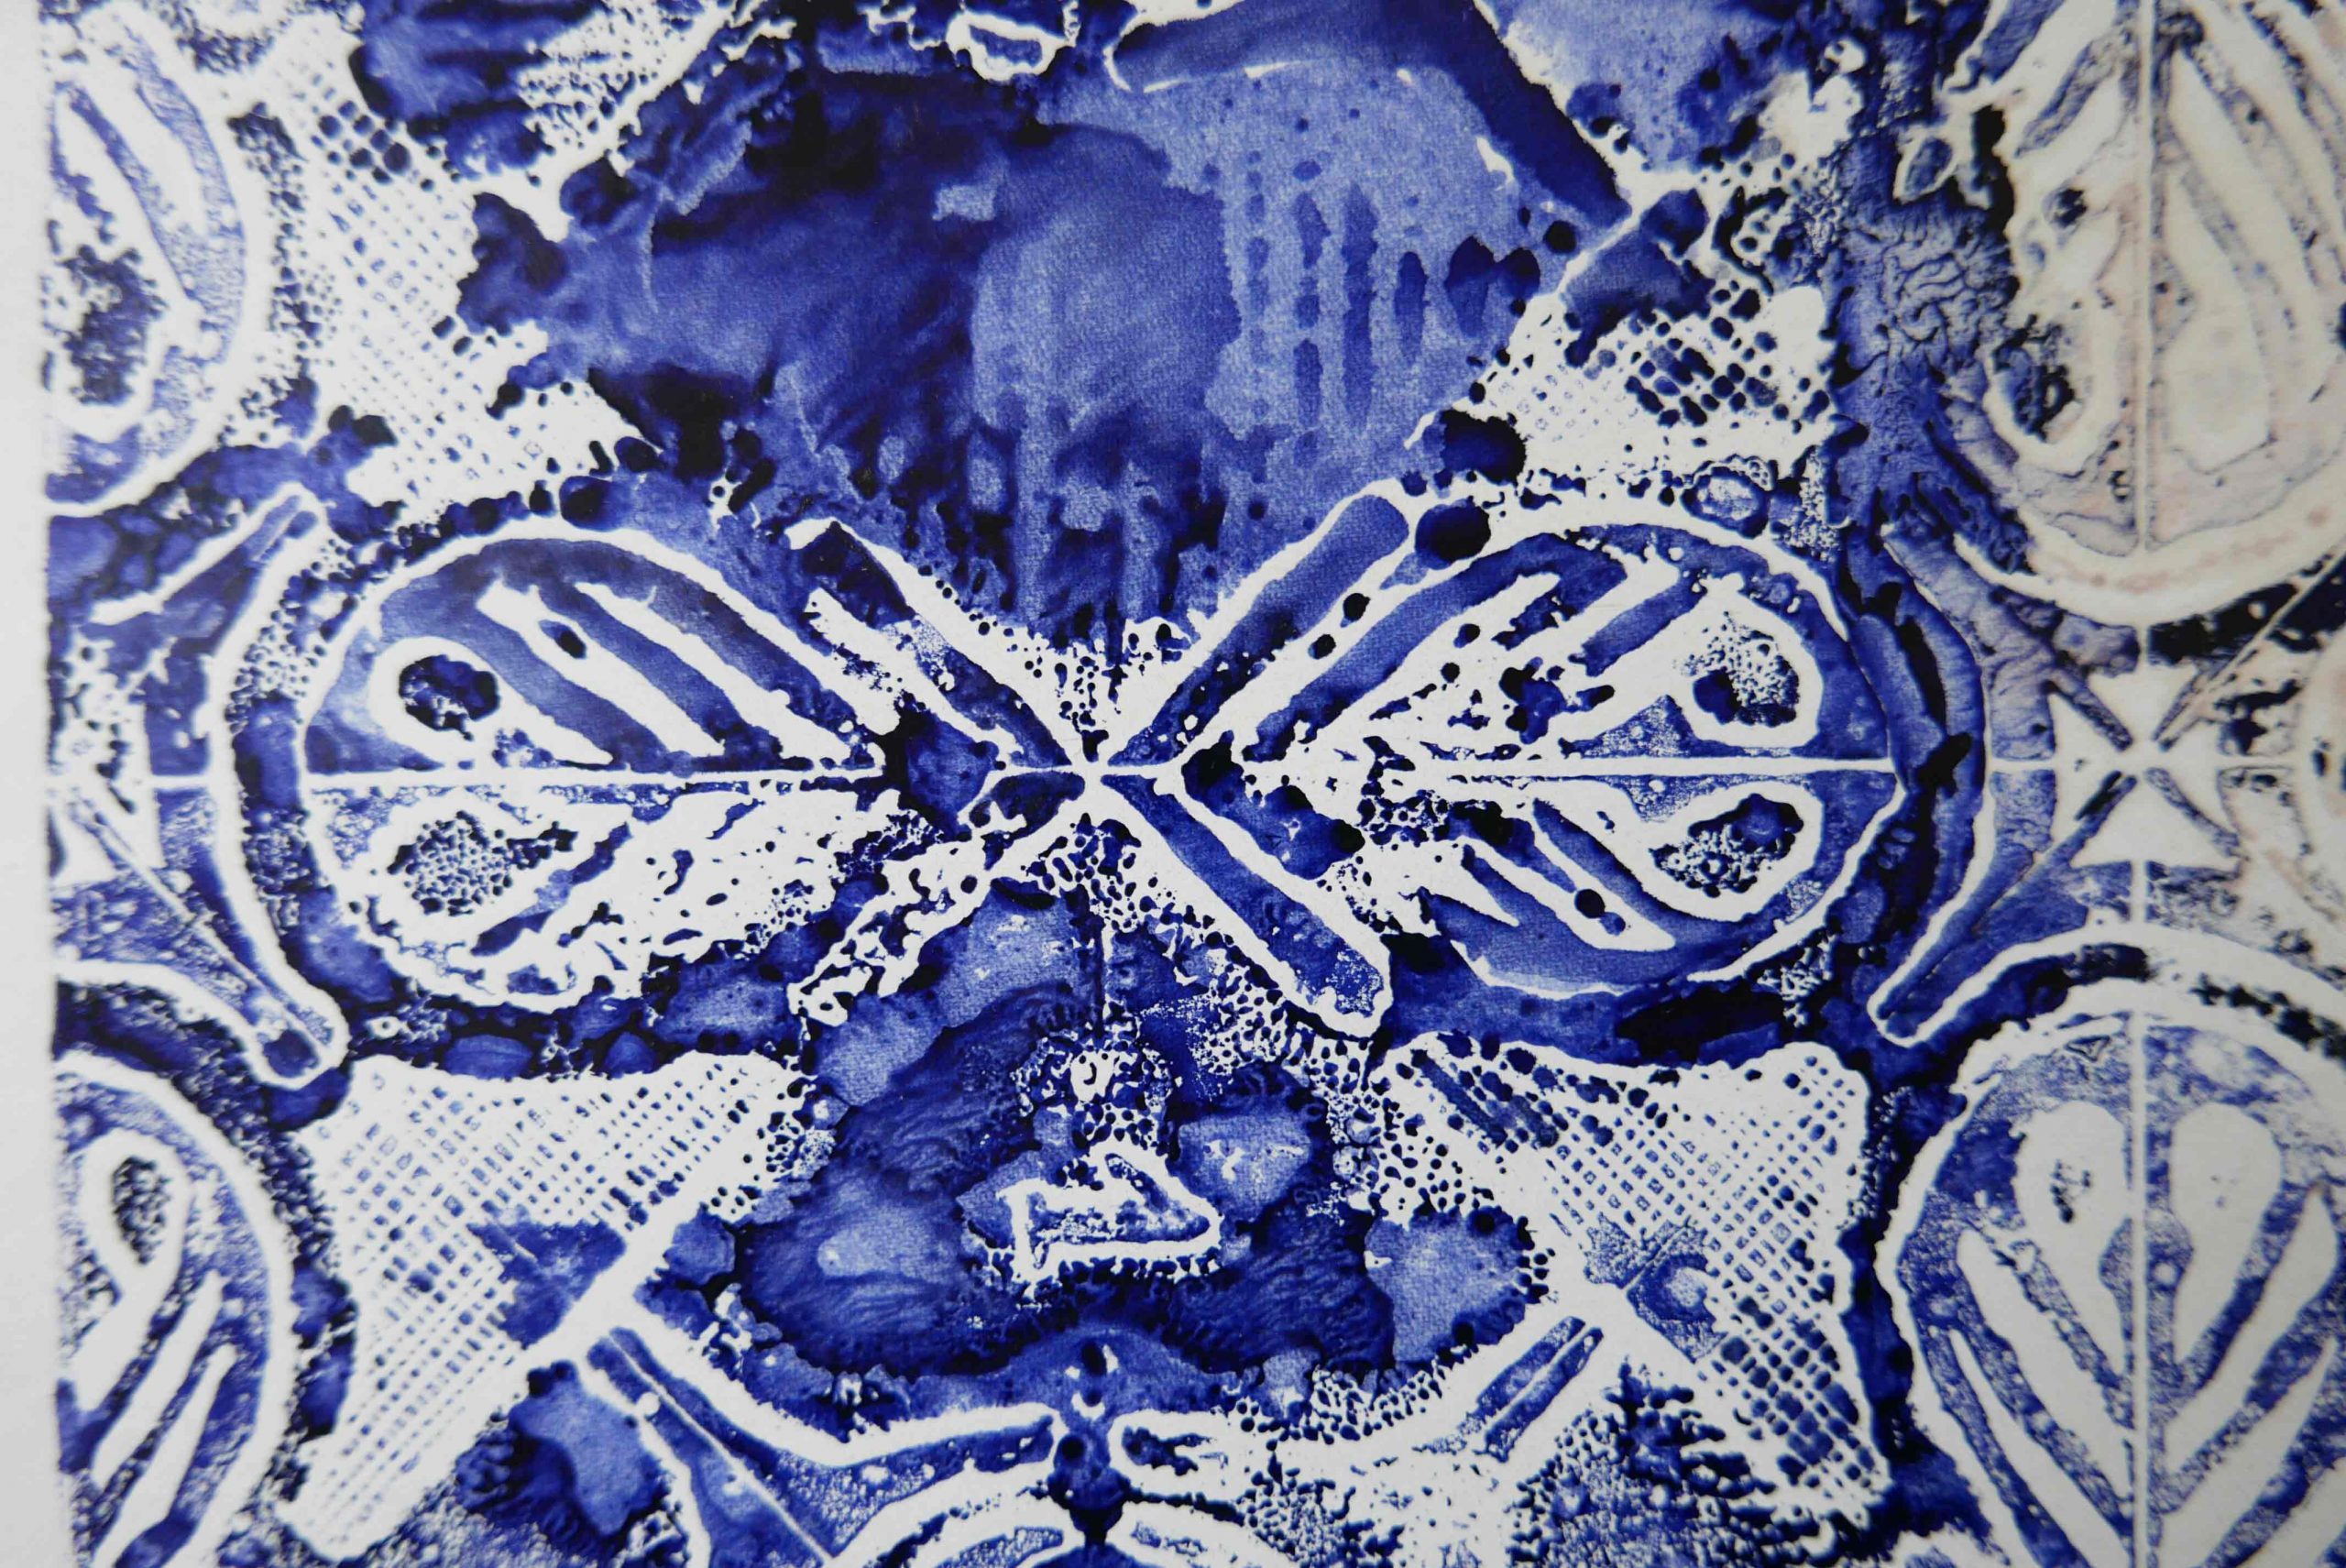 Tinte blau auf Papier Ornamentik